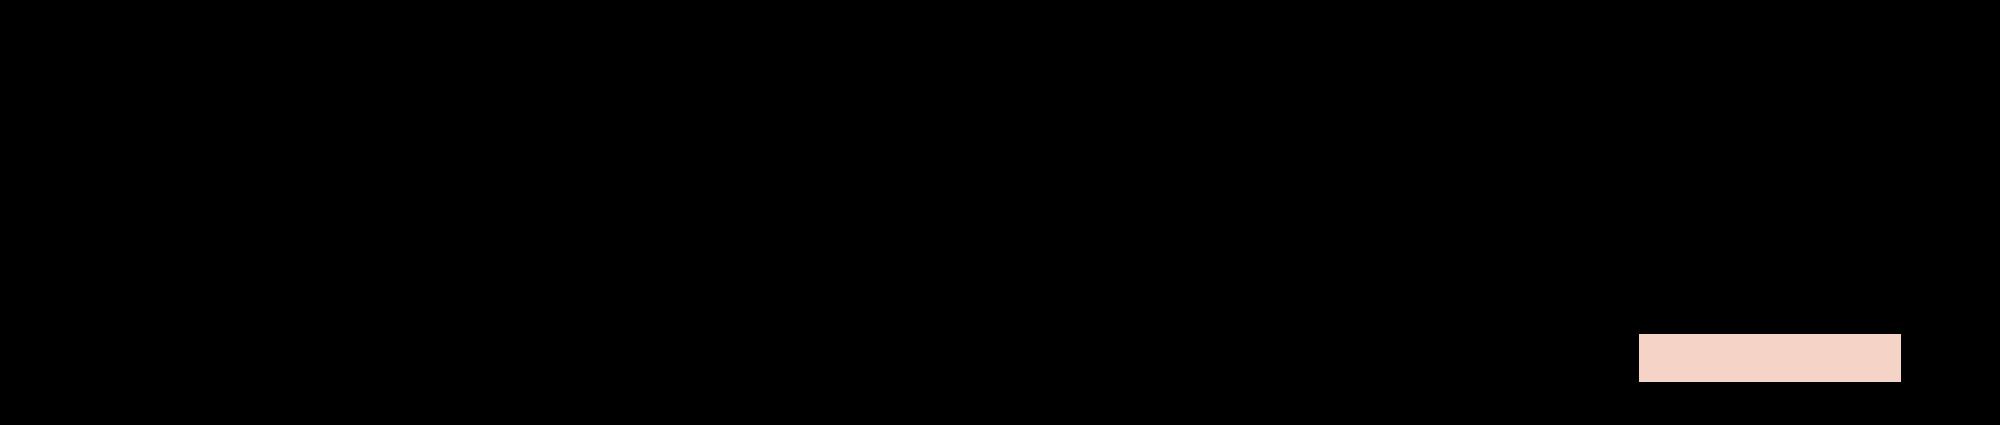 Brand-Kits_Logo.png